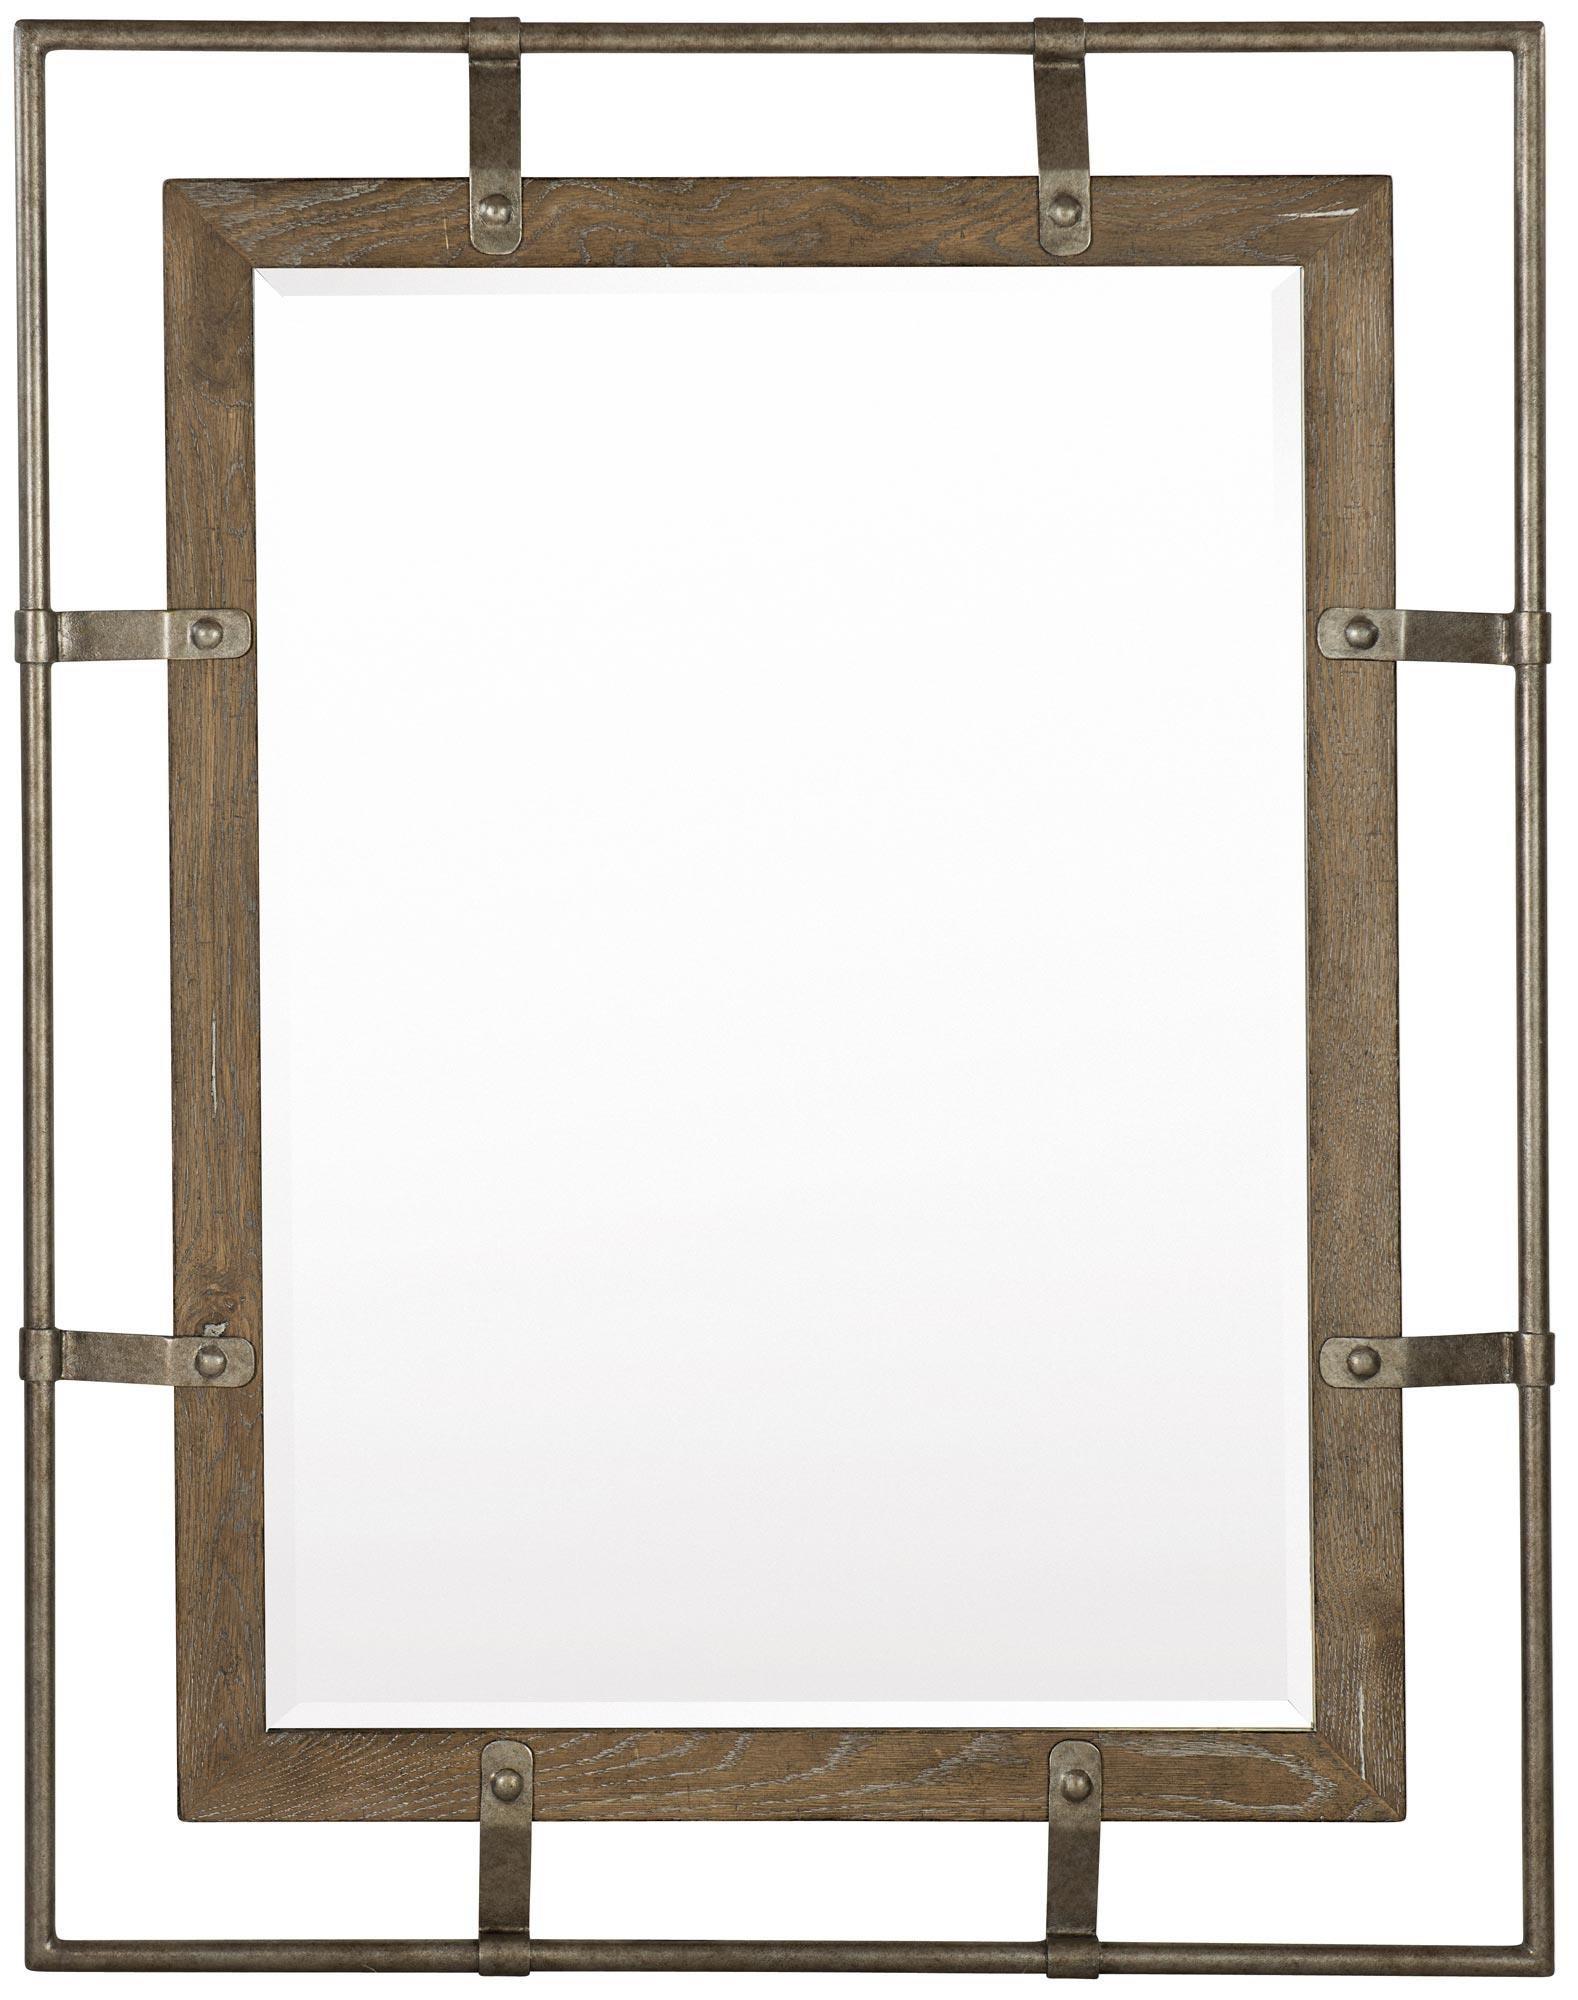 Rustic Patina Rustic Patina Mirror by Bernhardt at Morris Home